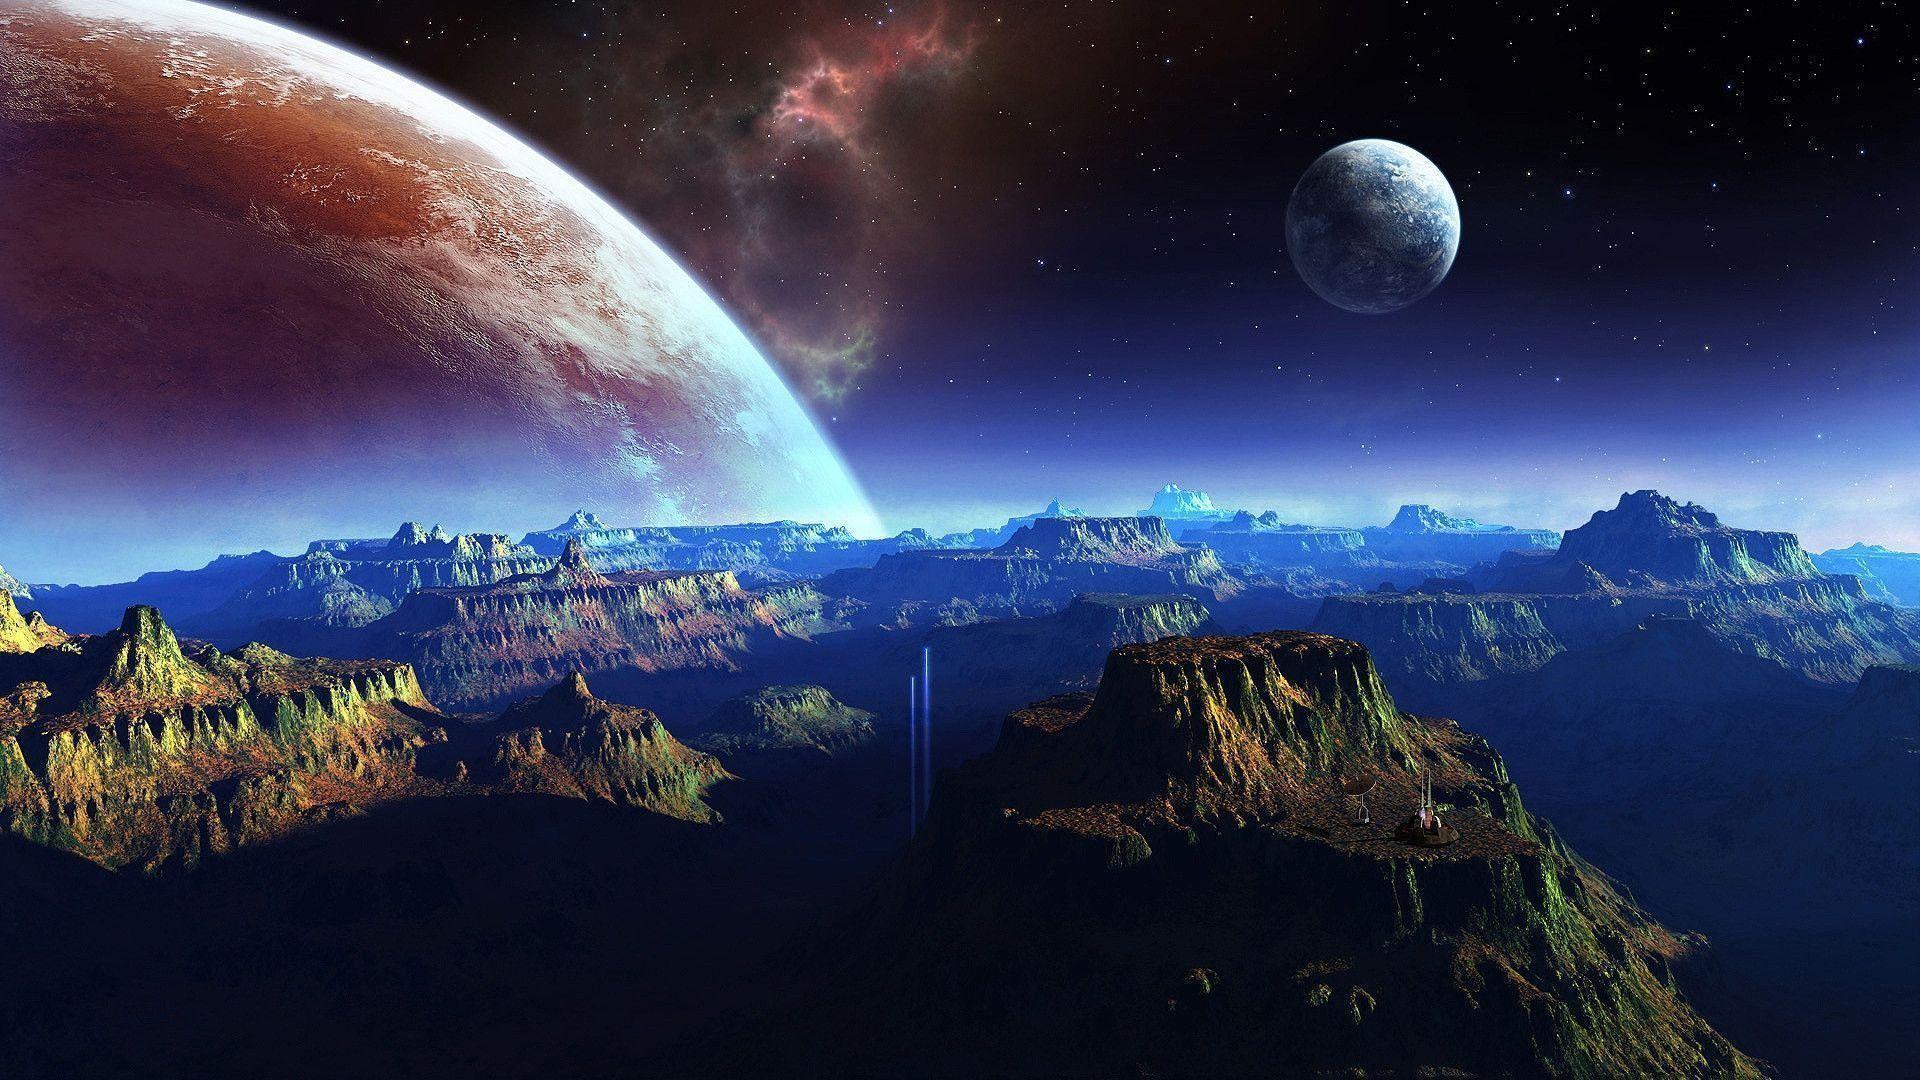 Fantasy planet space art Wallpaper